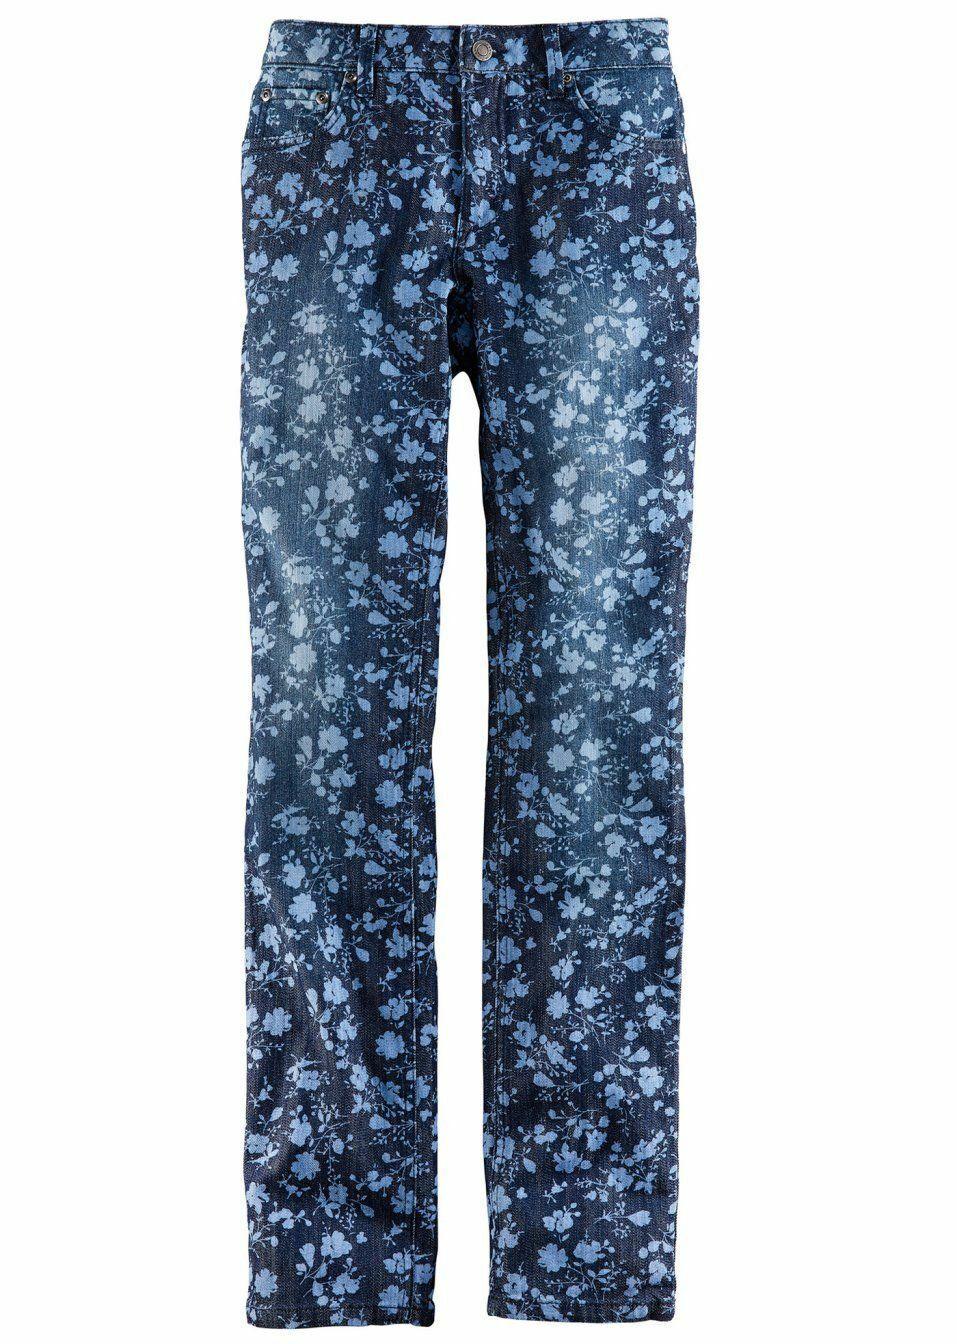 John Baner Damen Stretch Jeans Hose Blumen Muster Chino blau 950379